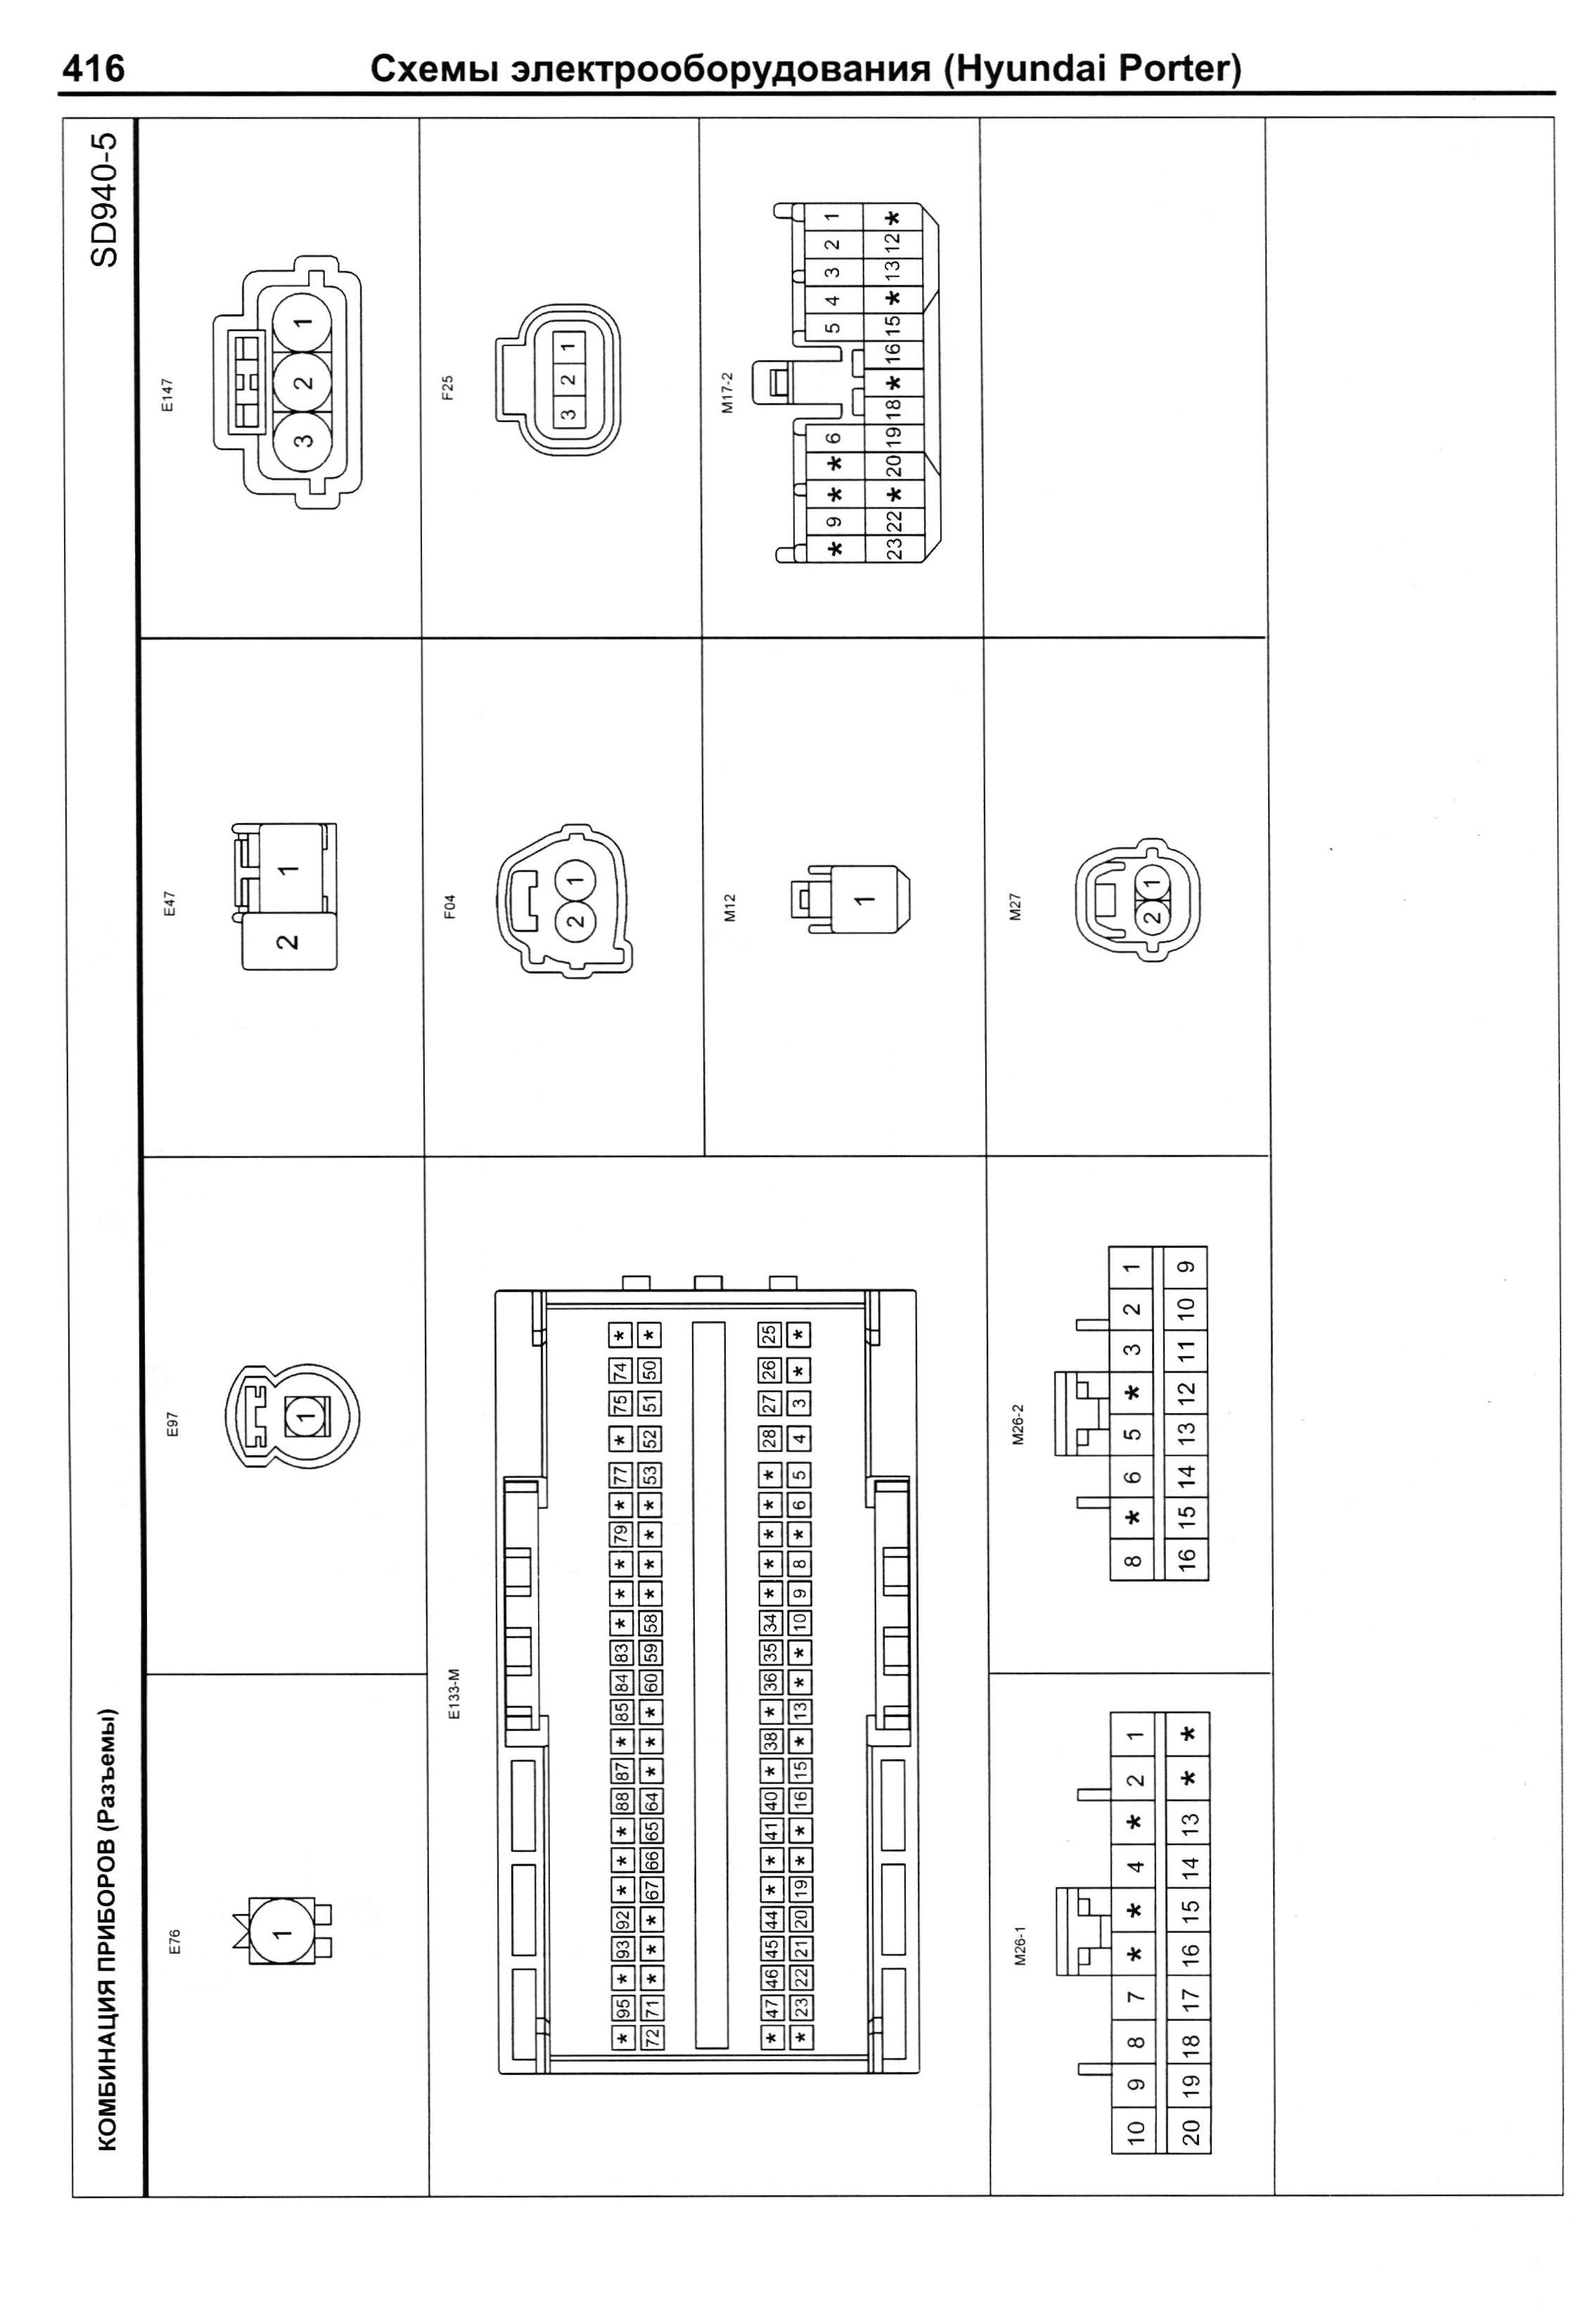 Схема электрооборудования hyundai porter